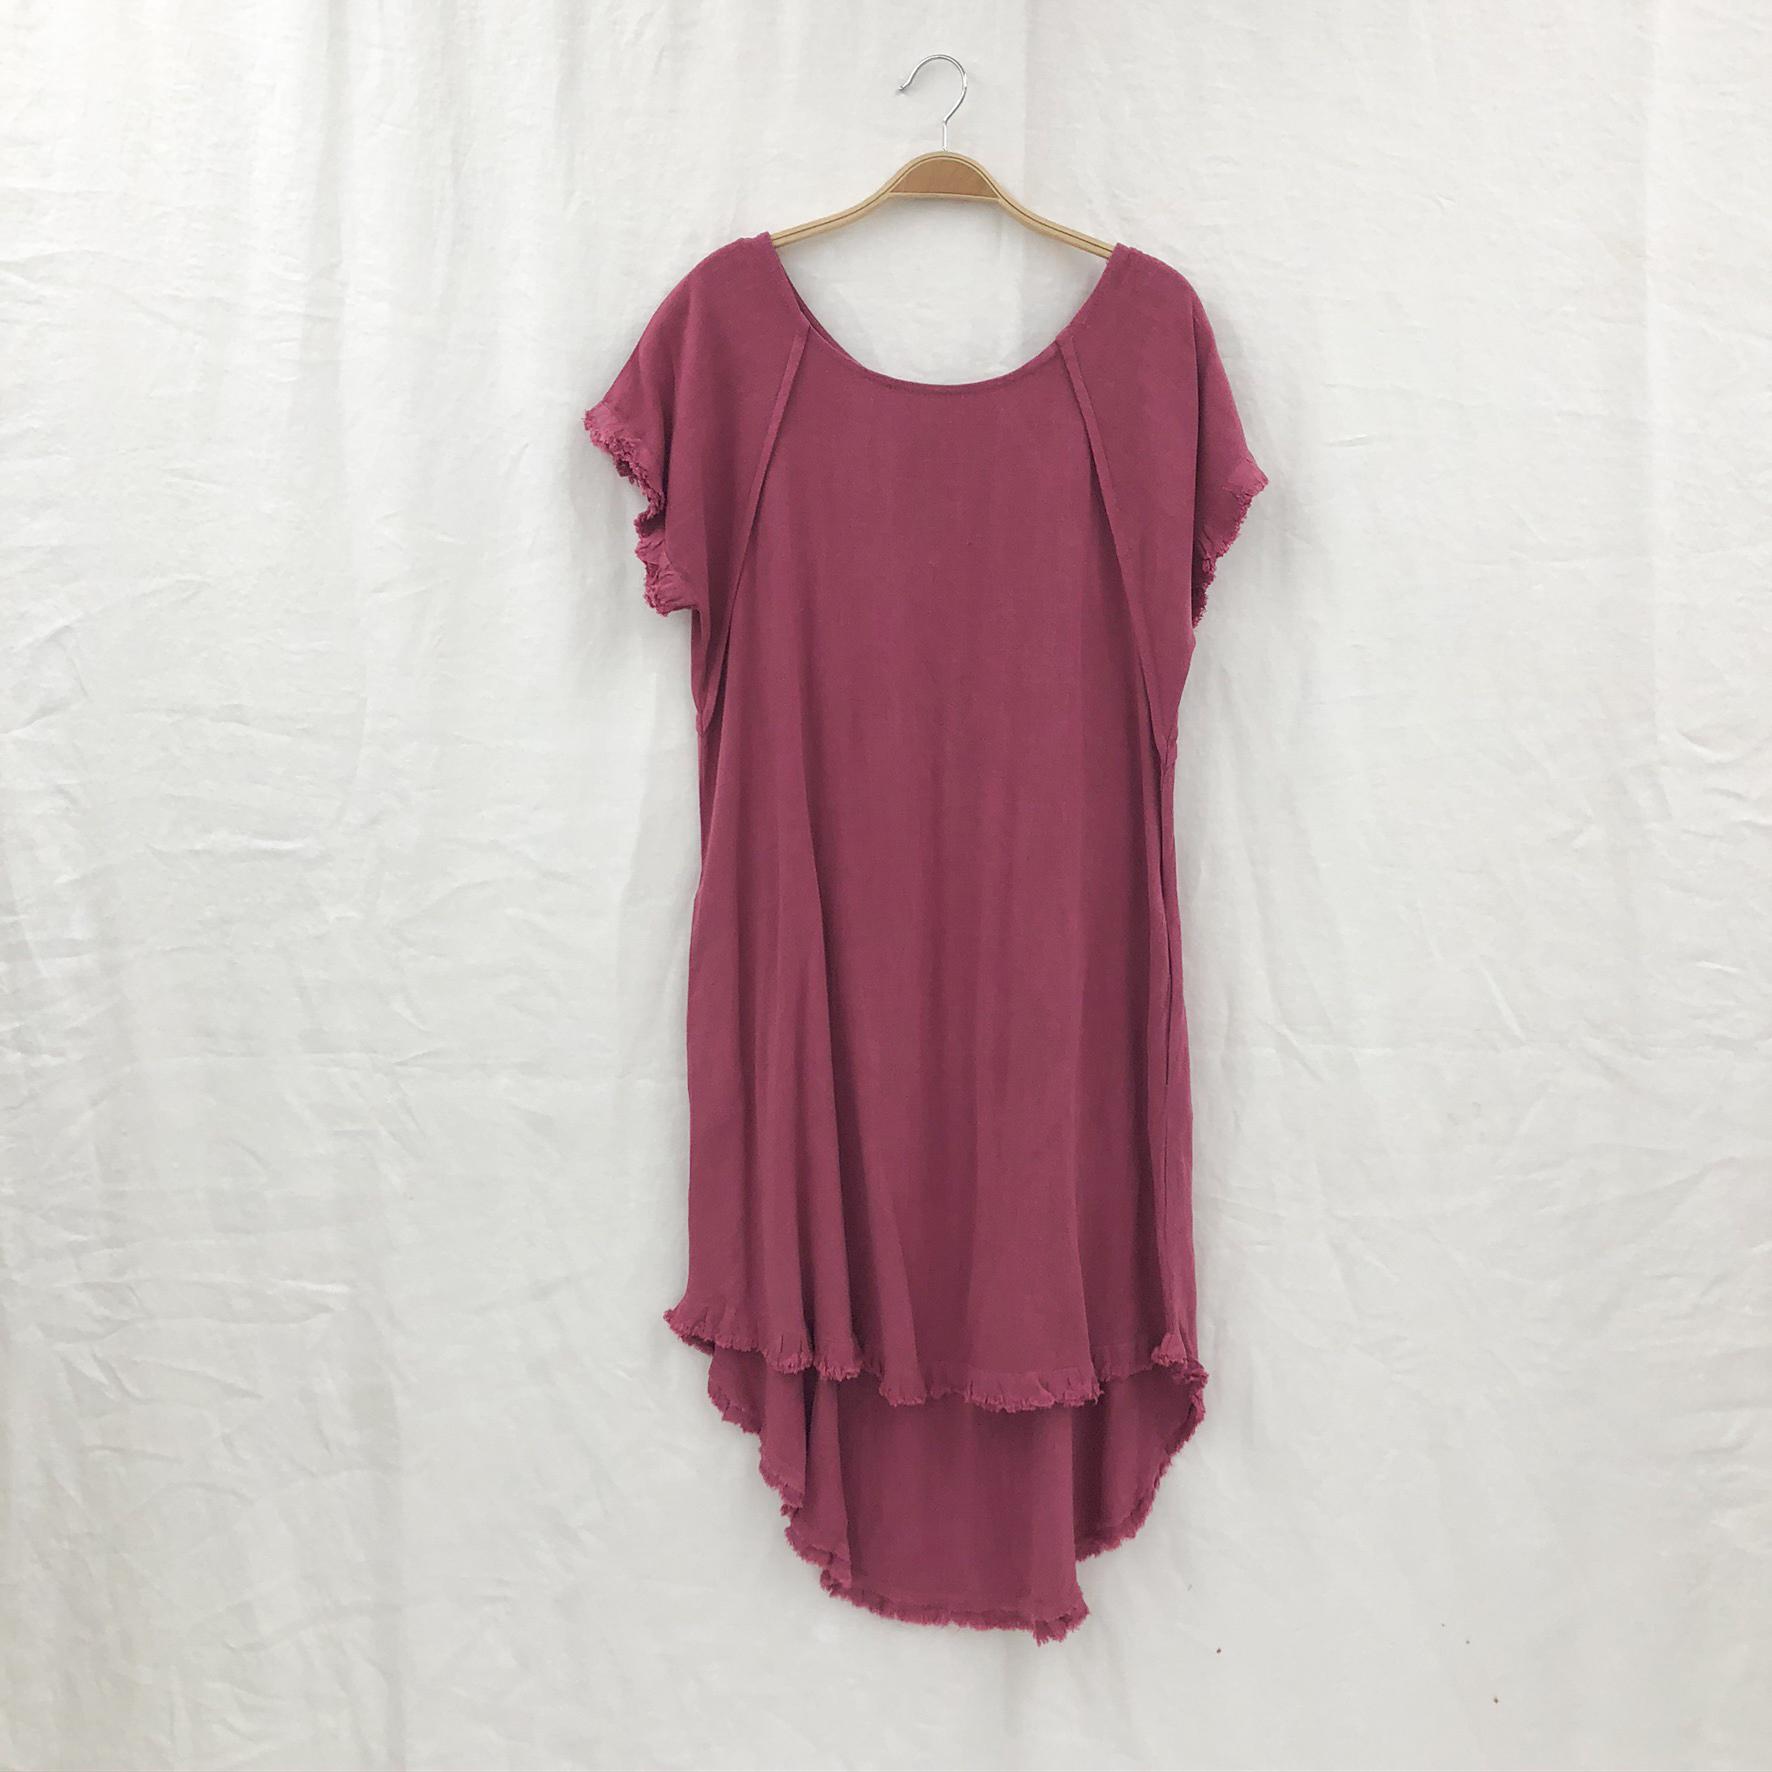 Round Neck Pocket Dress on a Hanger - Berry